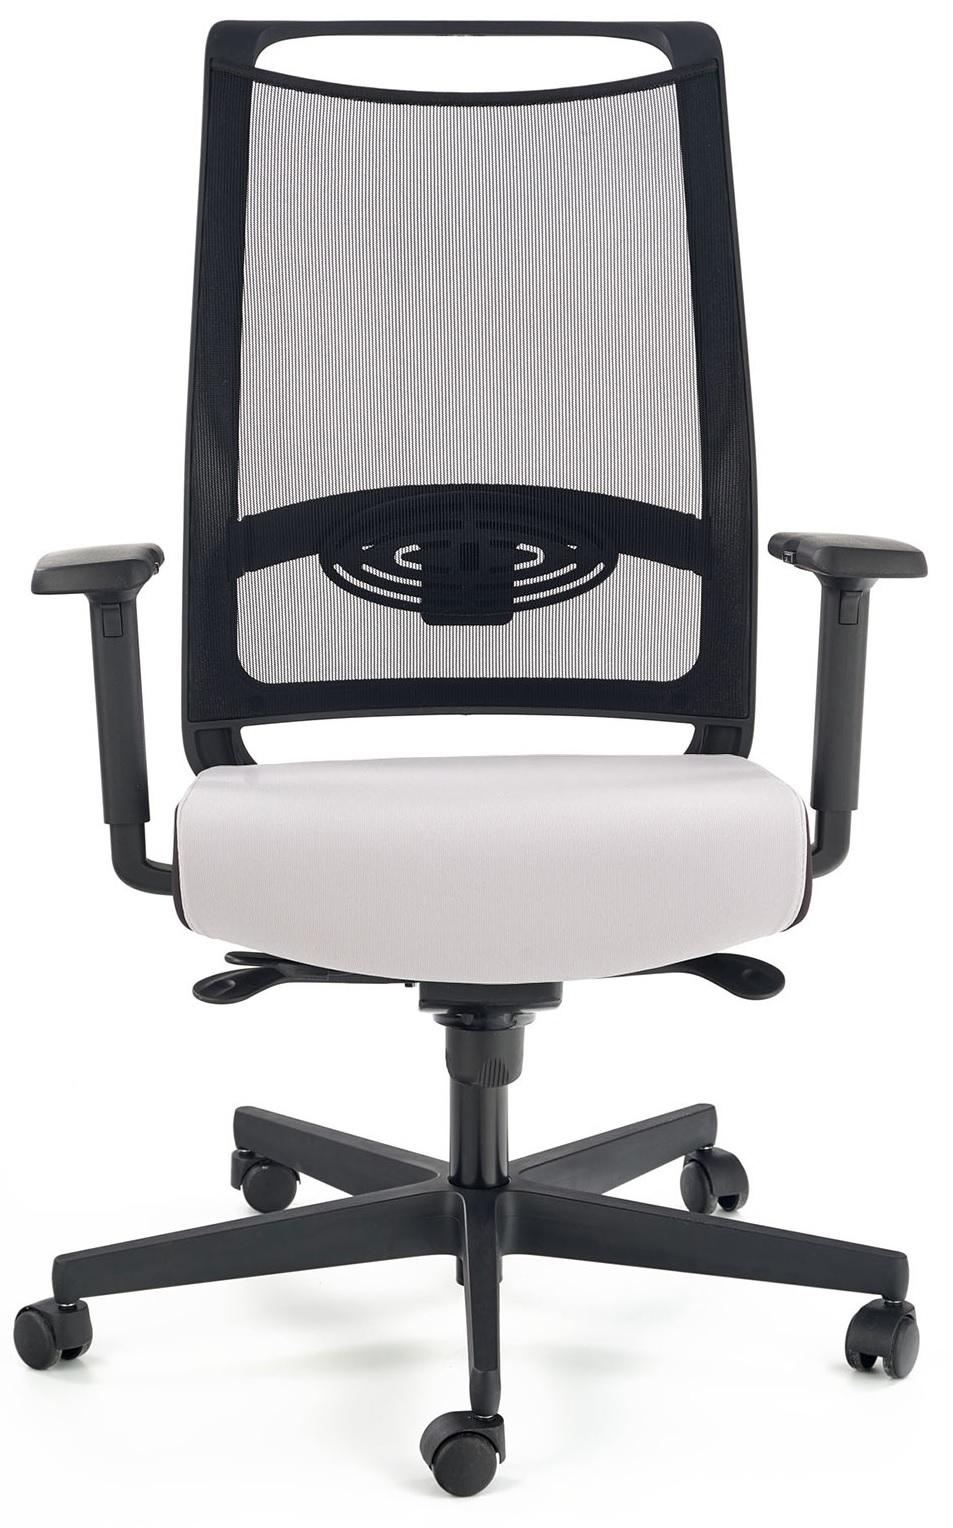 biuro kėdė gulietta